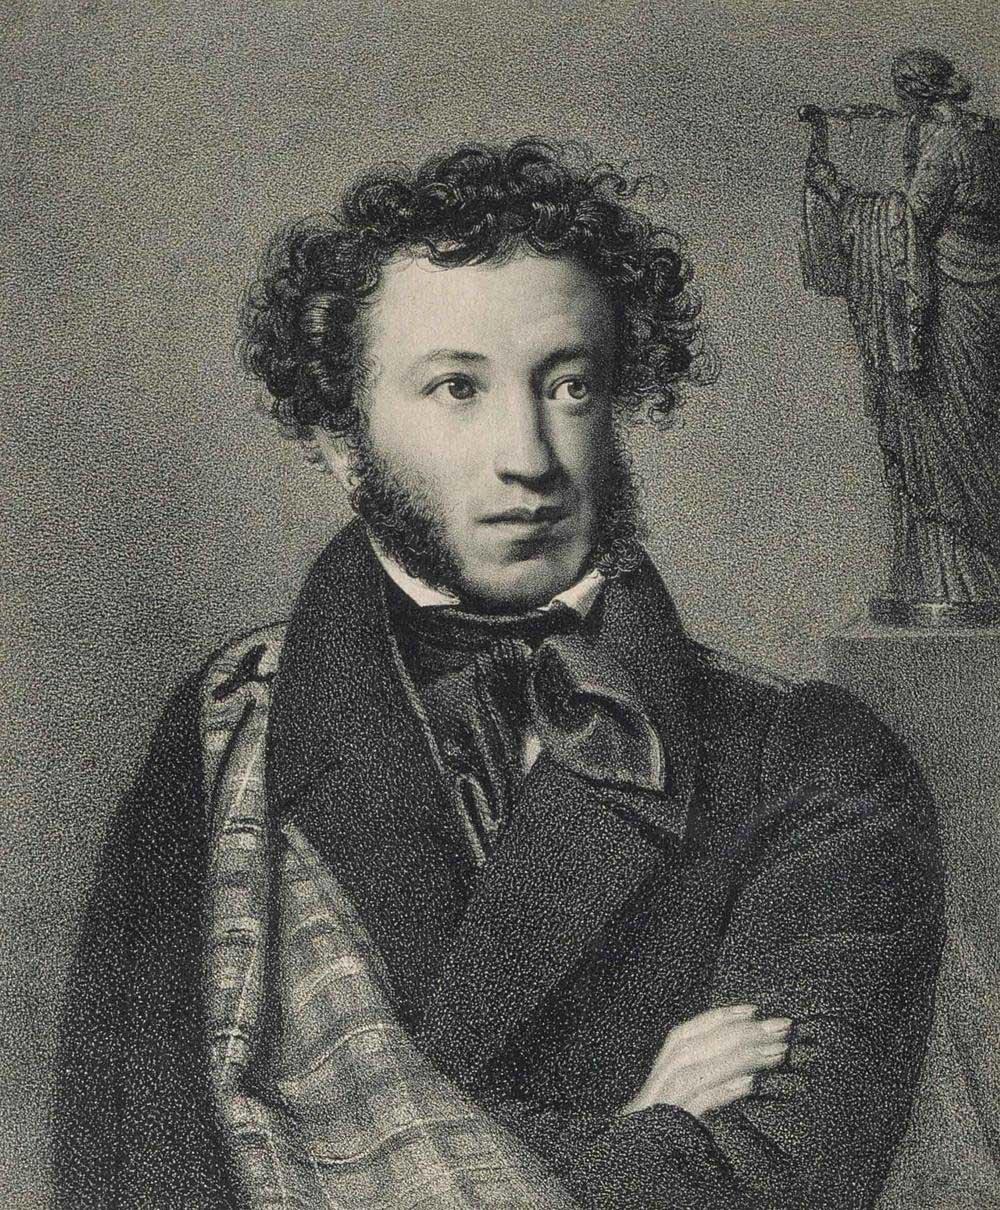 Картинка александра пушкина